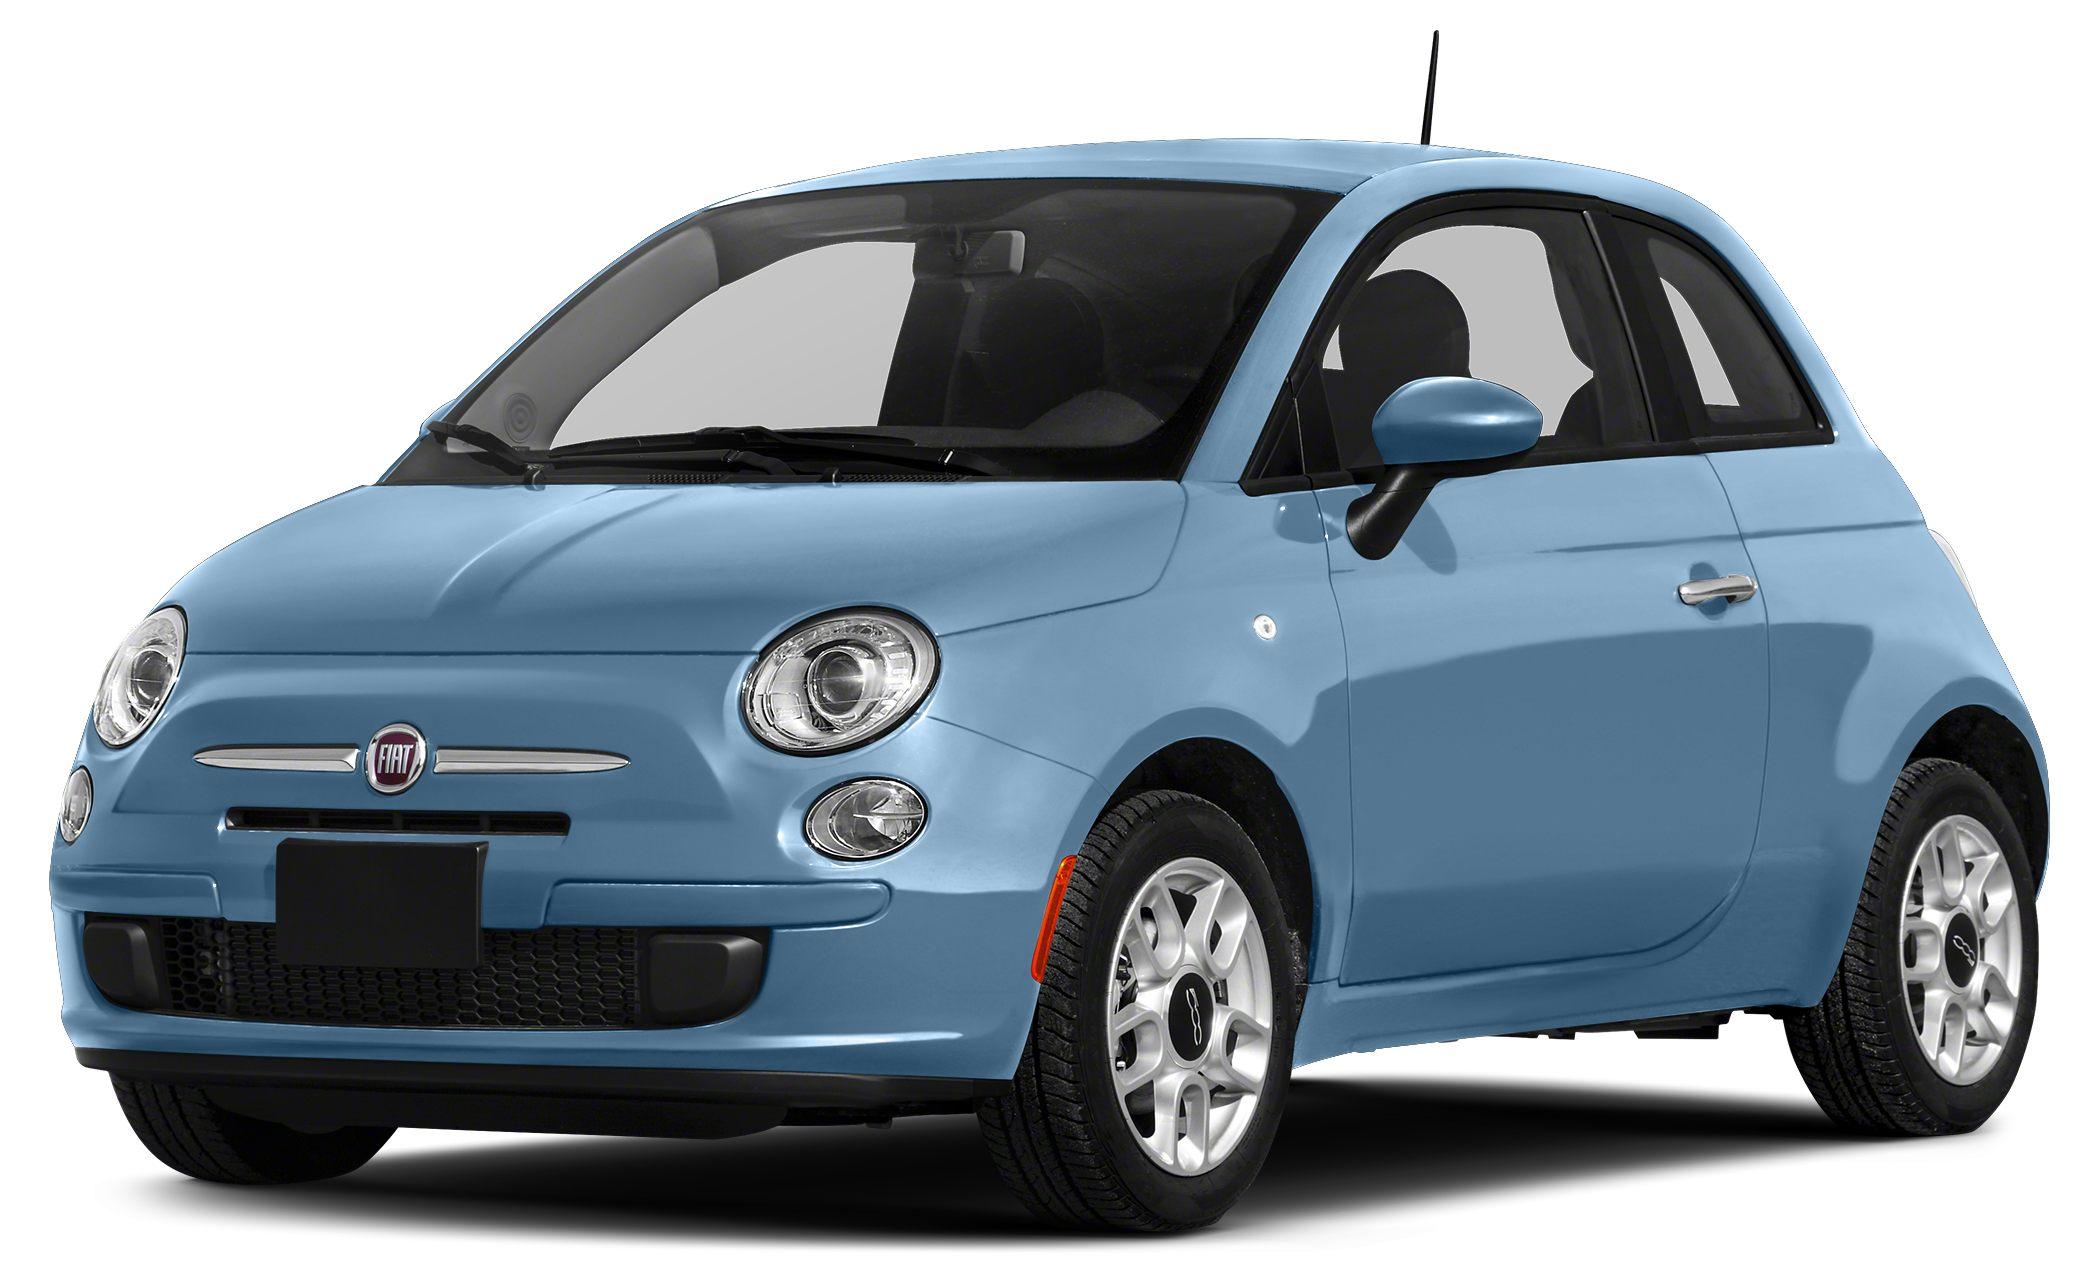 2015 FIAT 500 Lounge Miles 21464Color Celeste Blu Retro Light Blue Stock 6H7115C VIN 3C3CF